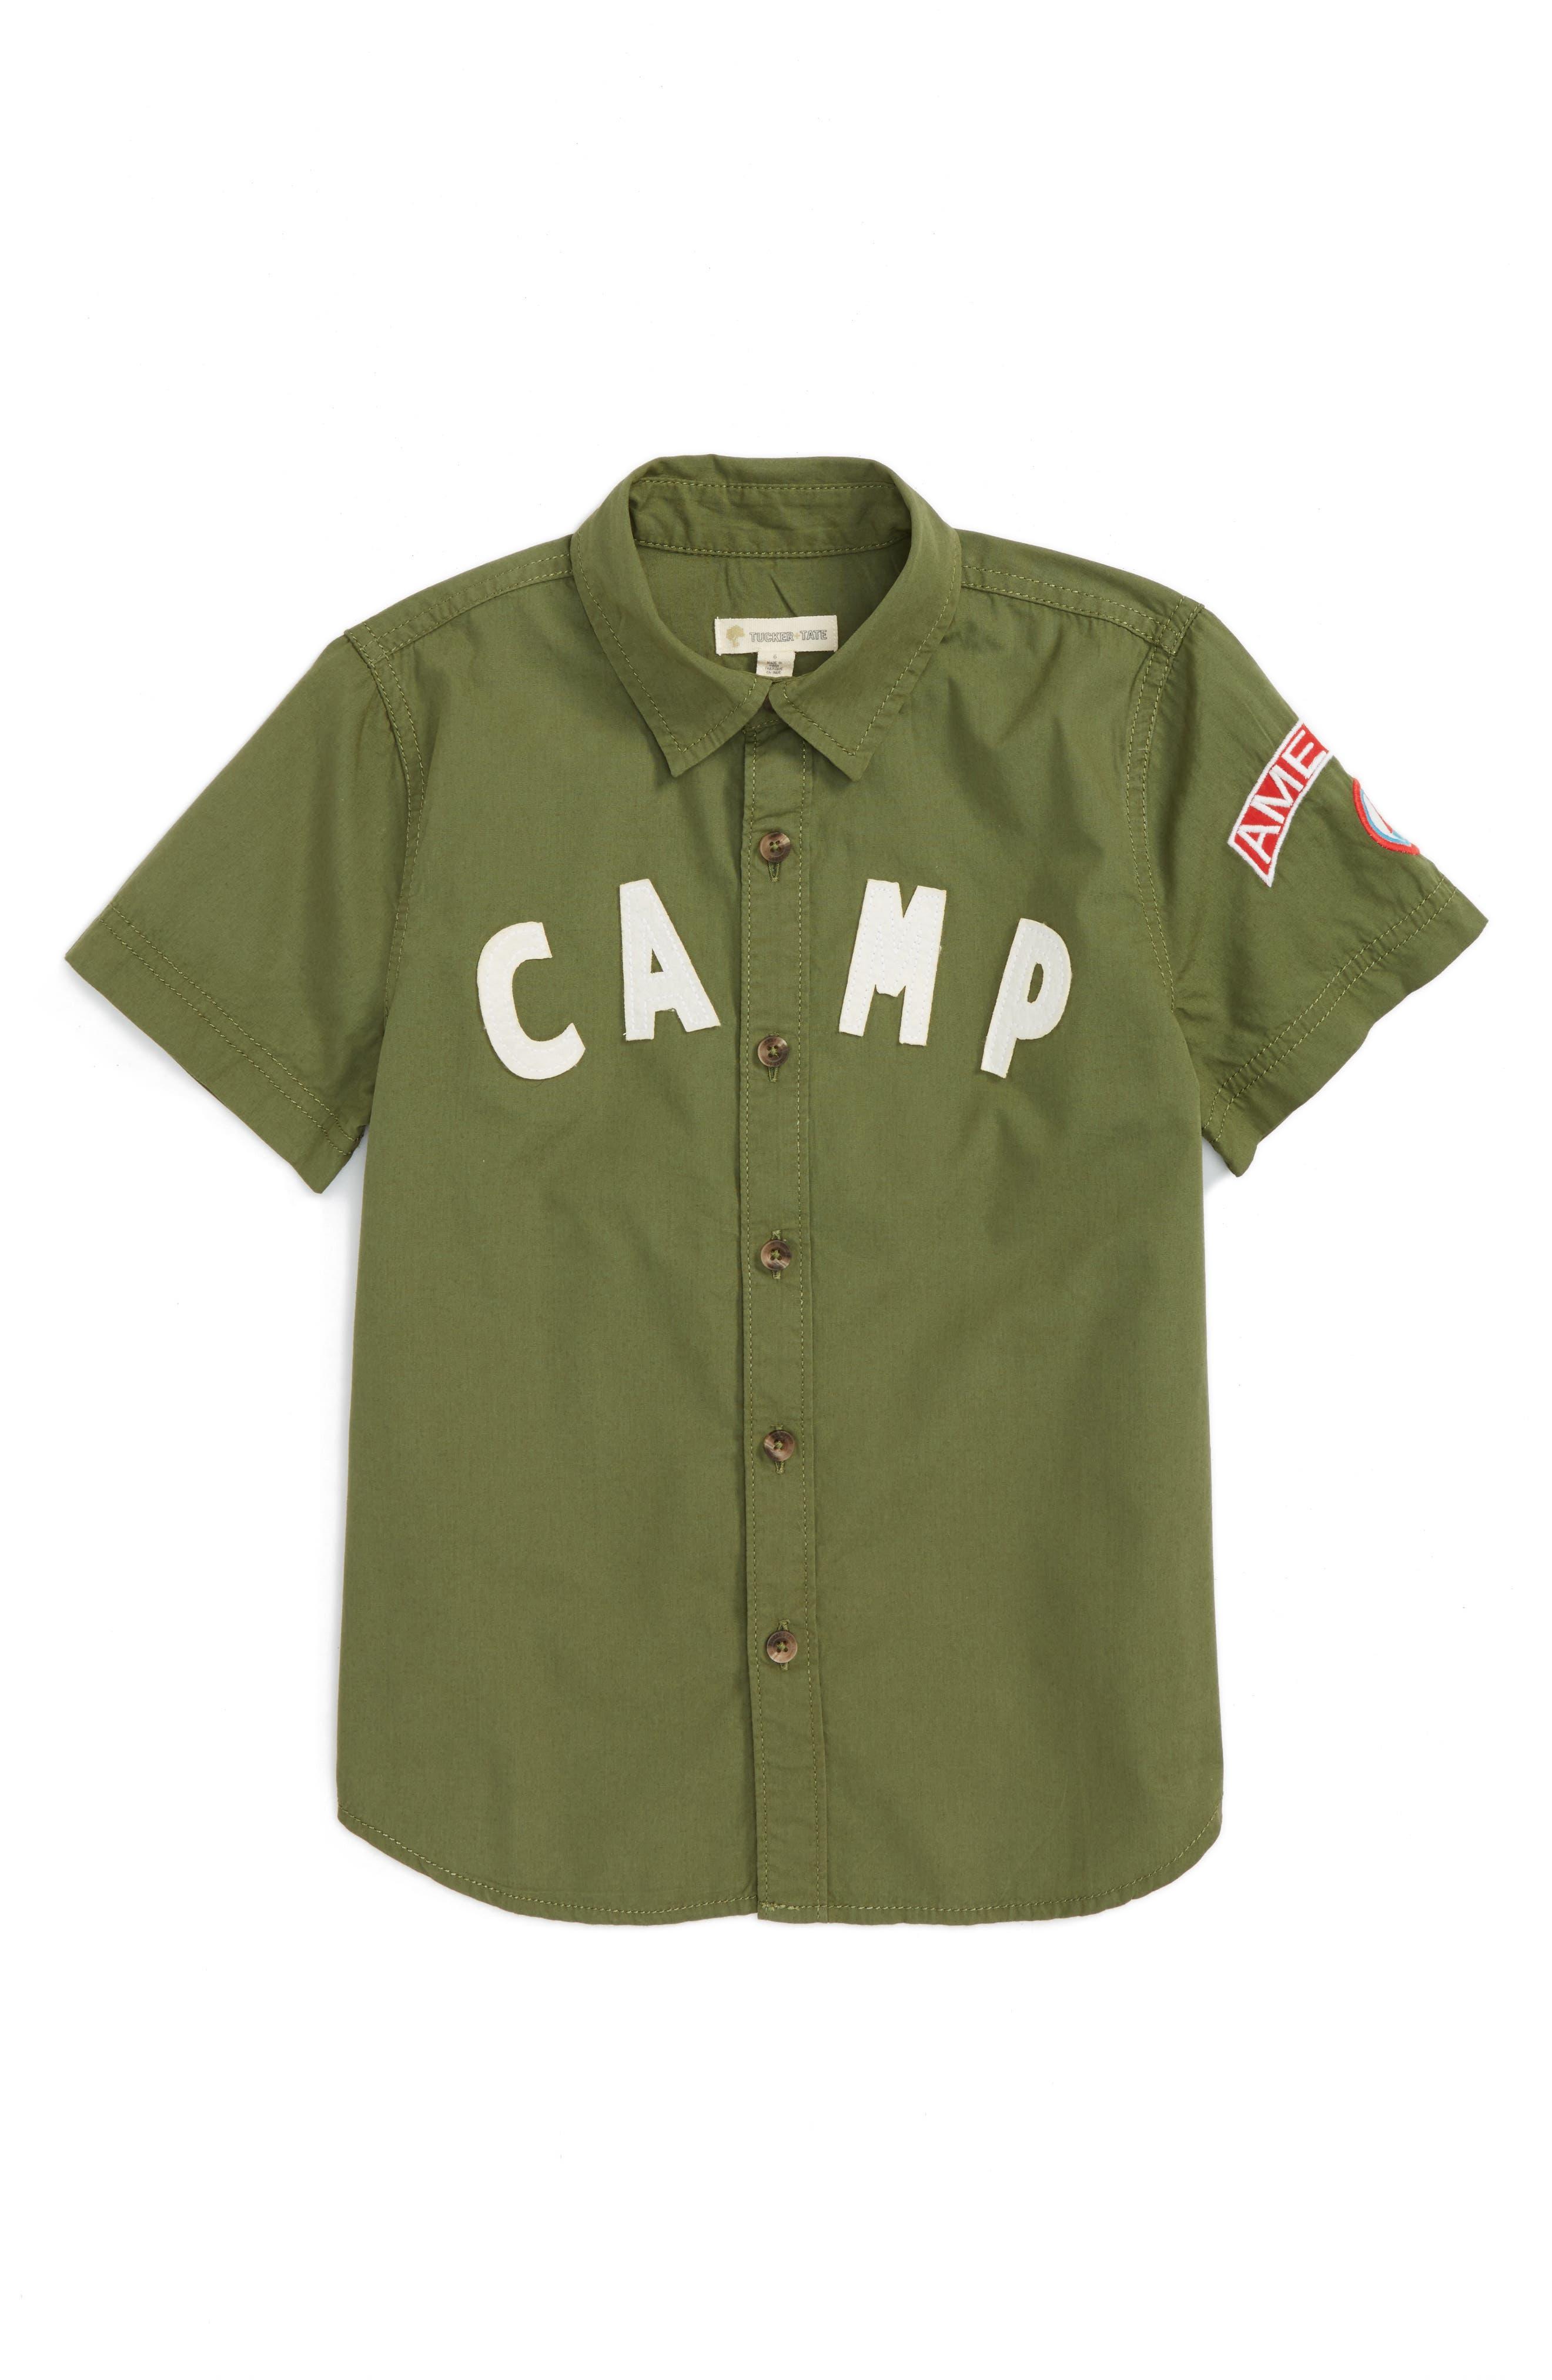 Main Image - Tucker + Tate Camp Shirt (Toddler Boys & Little Boys)